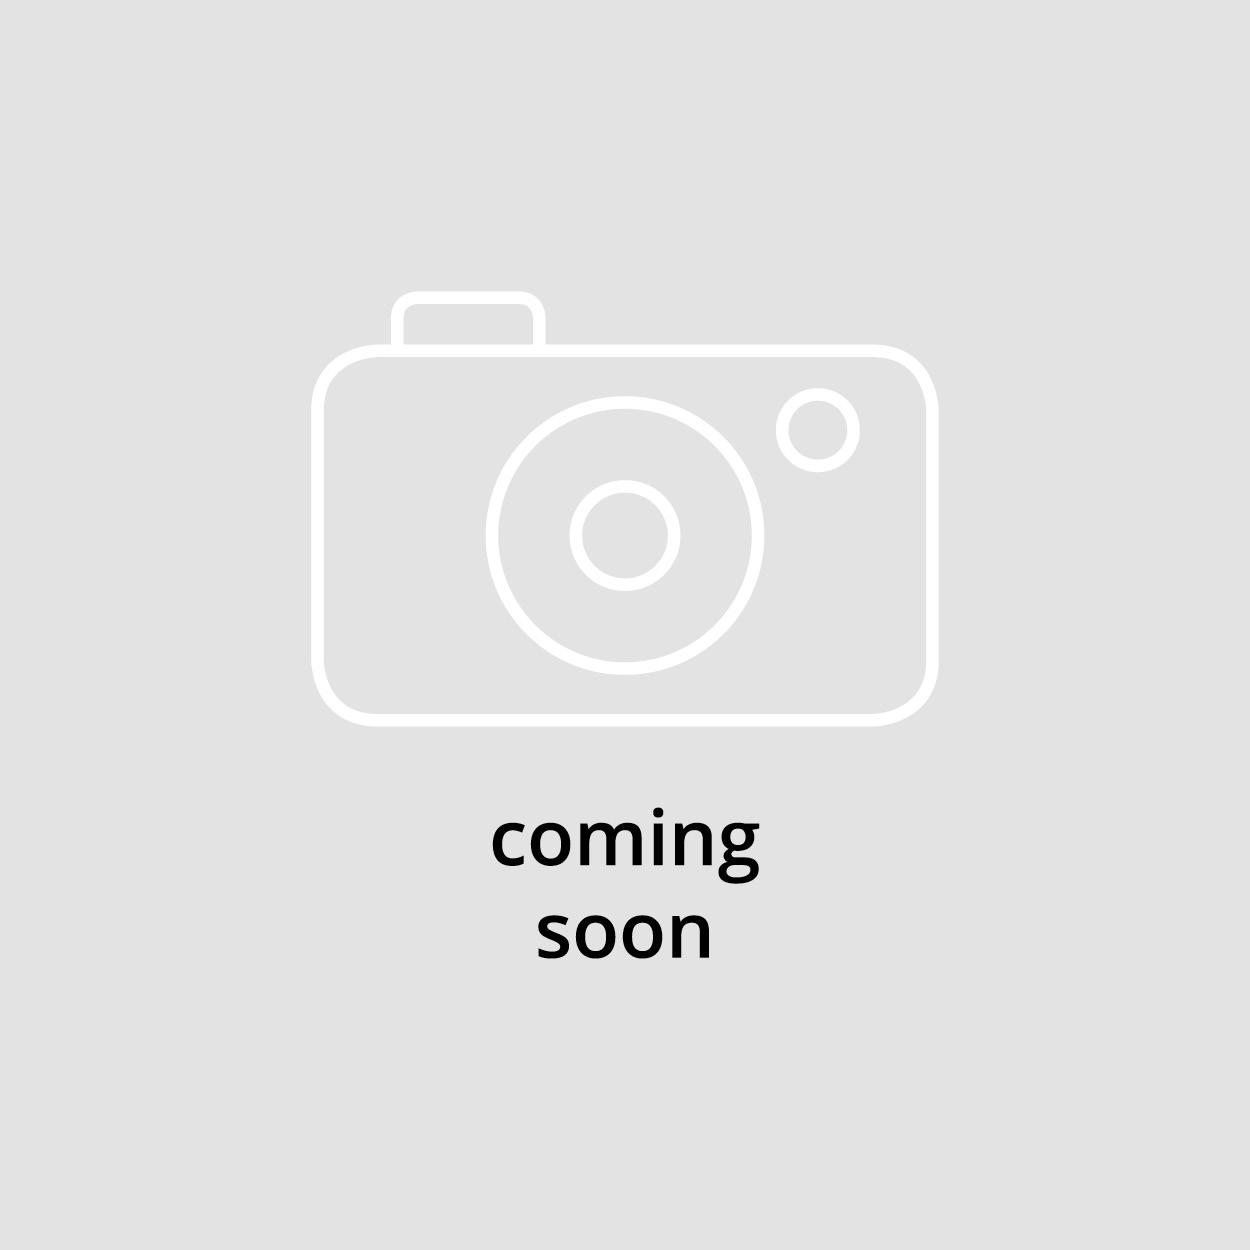 53.34.010 Torretta pos. 6 per portautensili Gr.1 SST per Gildemeister  GM16AC